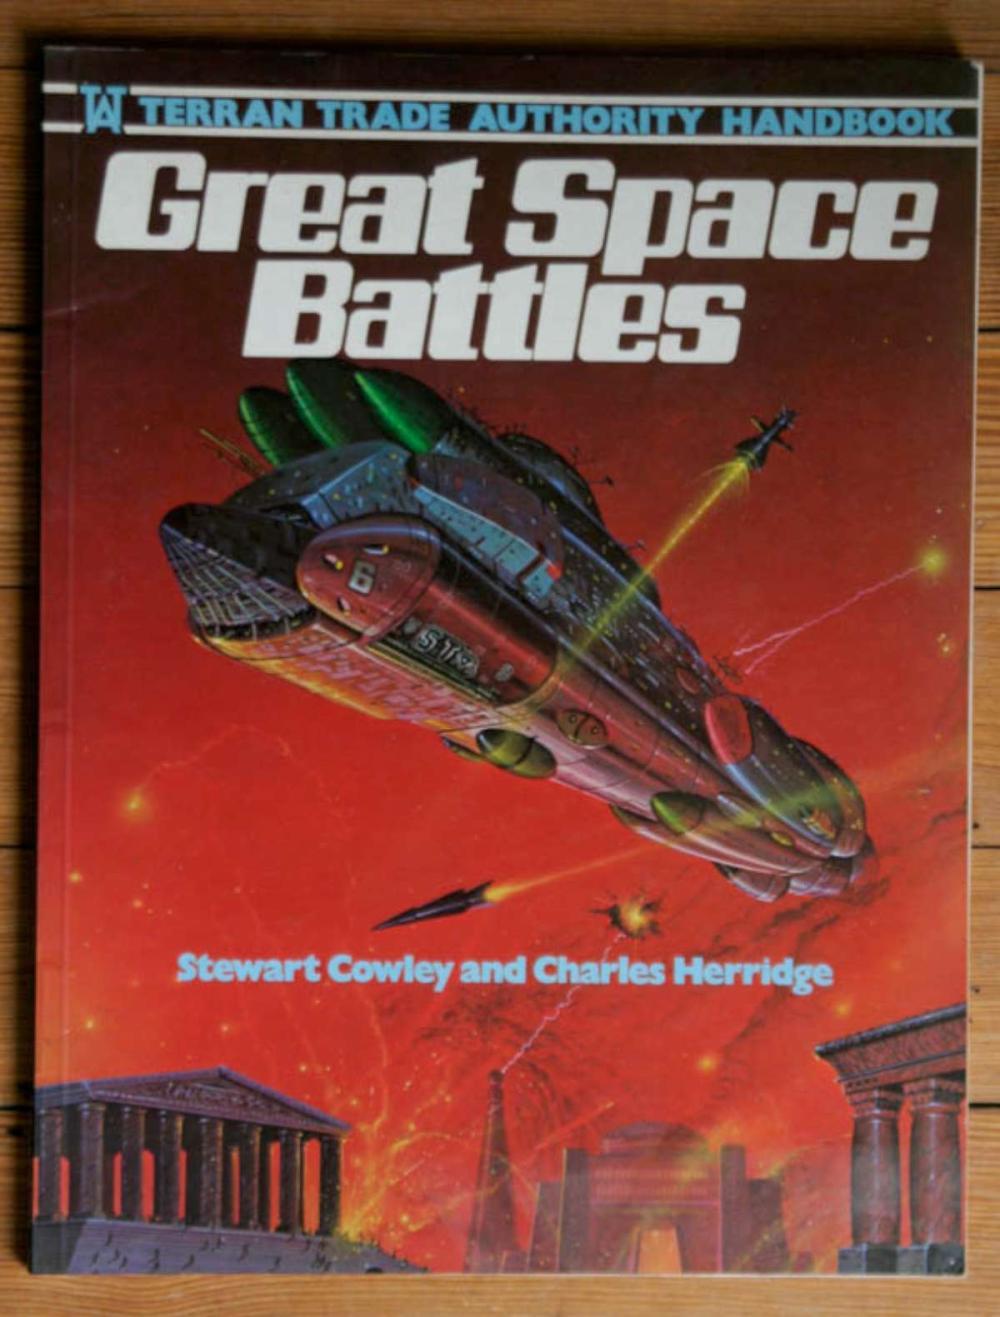 vintage Great Space Battles book